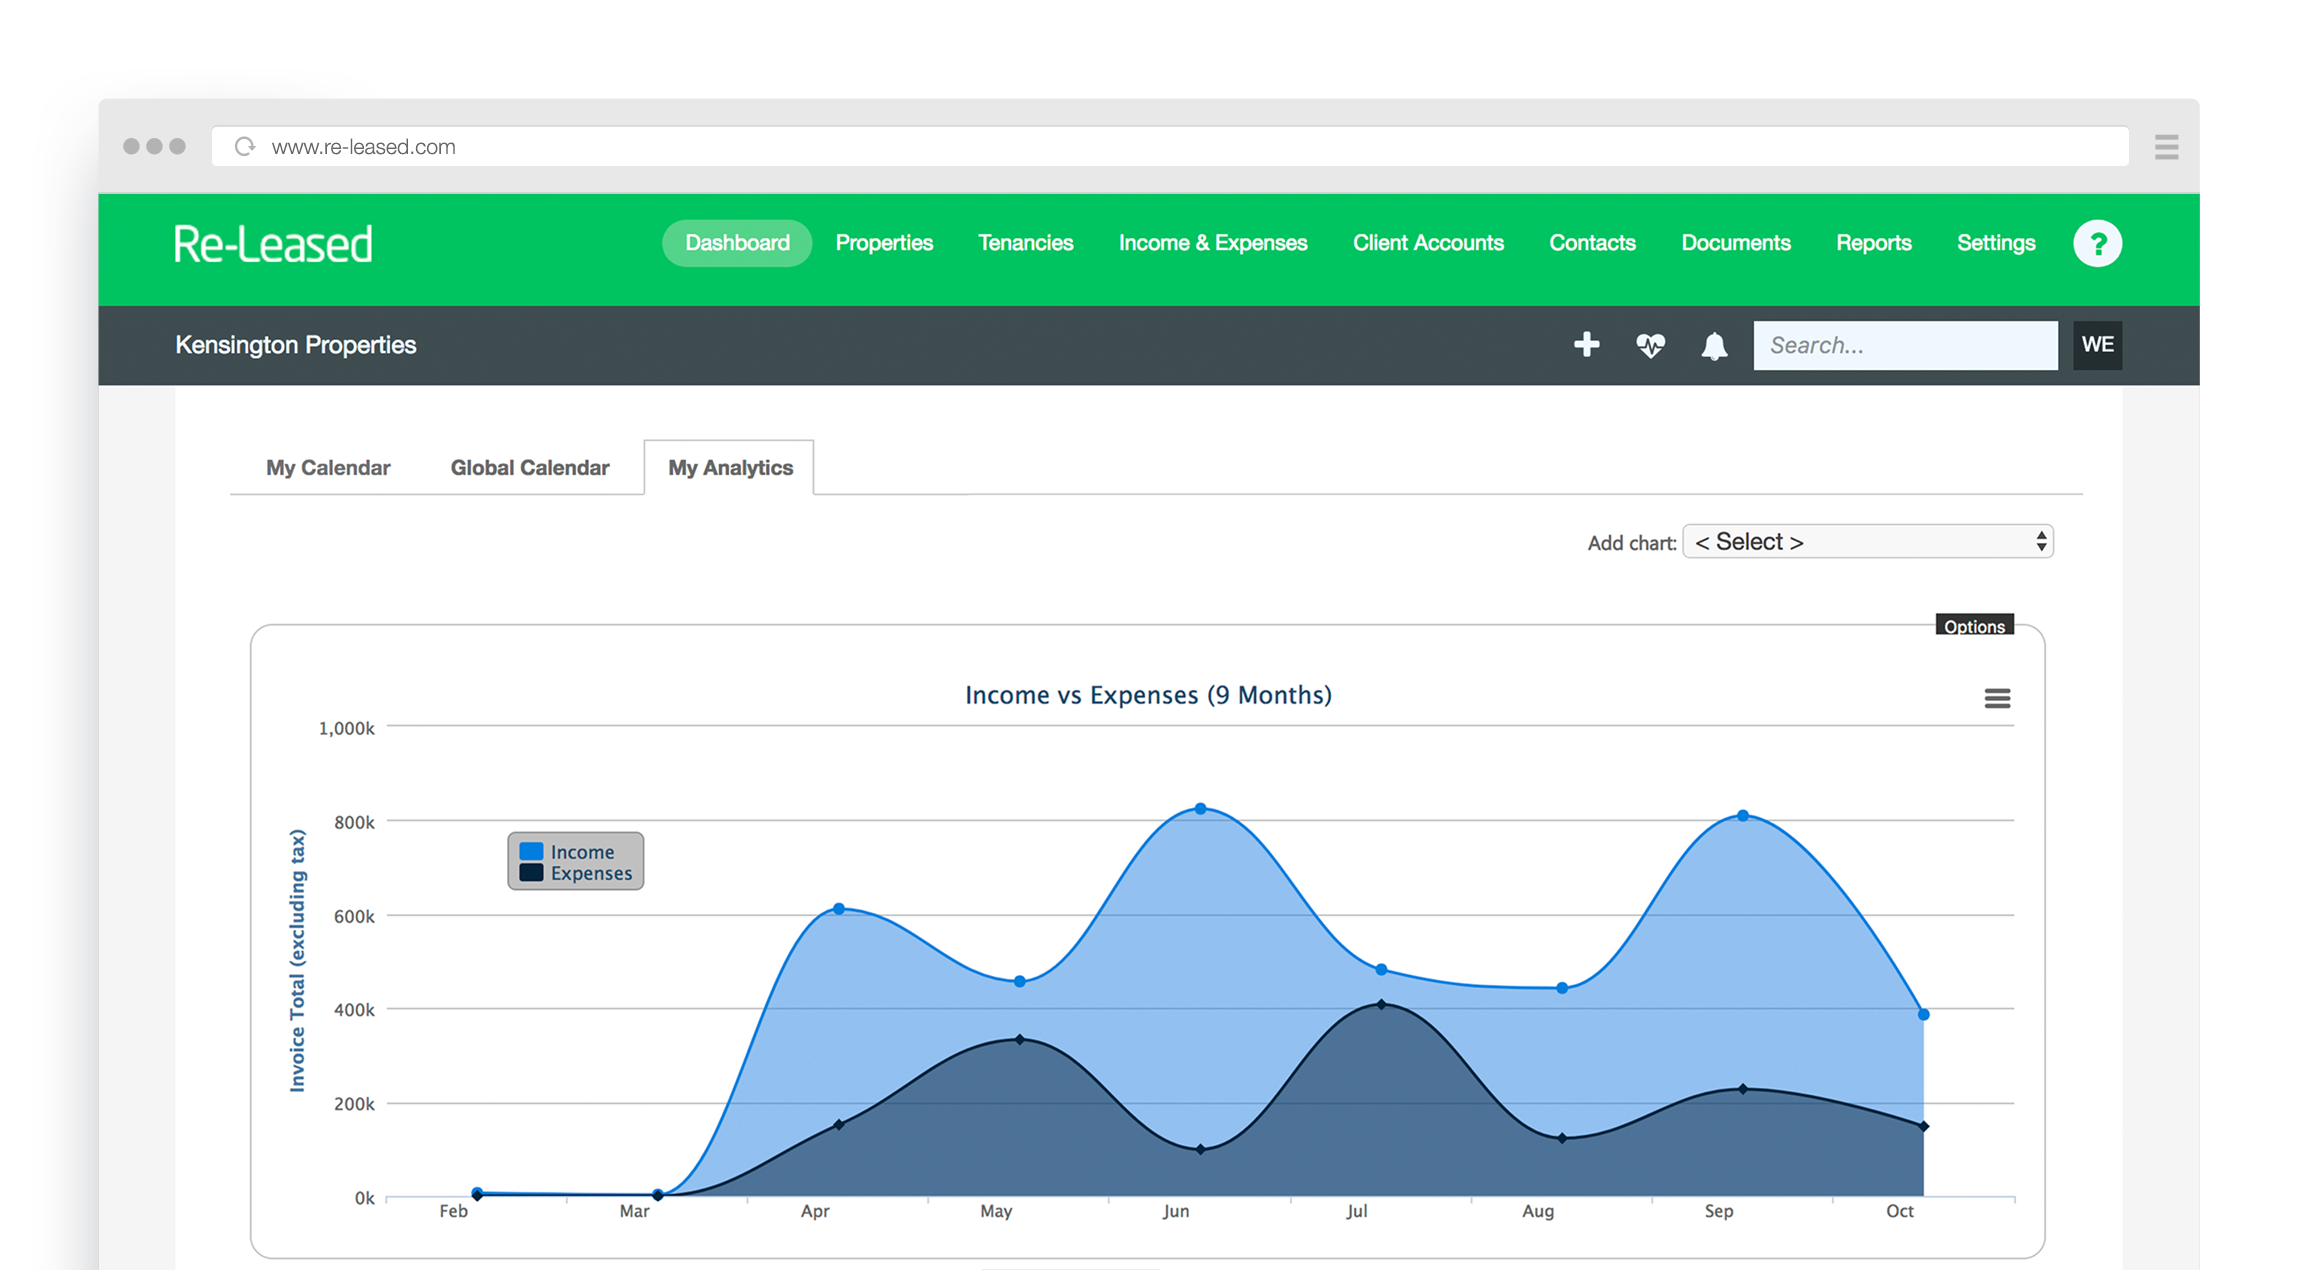 Start Visualising Your Property Data